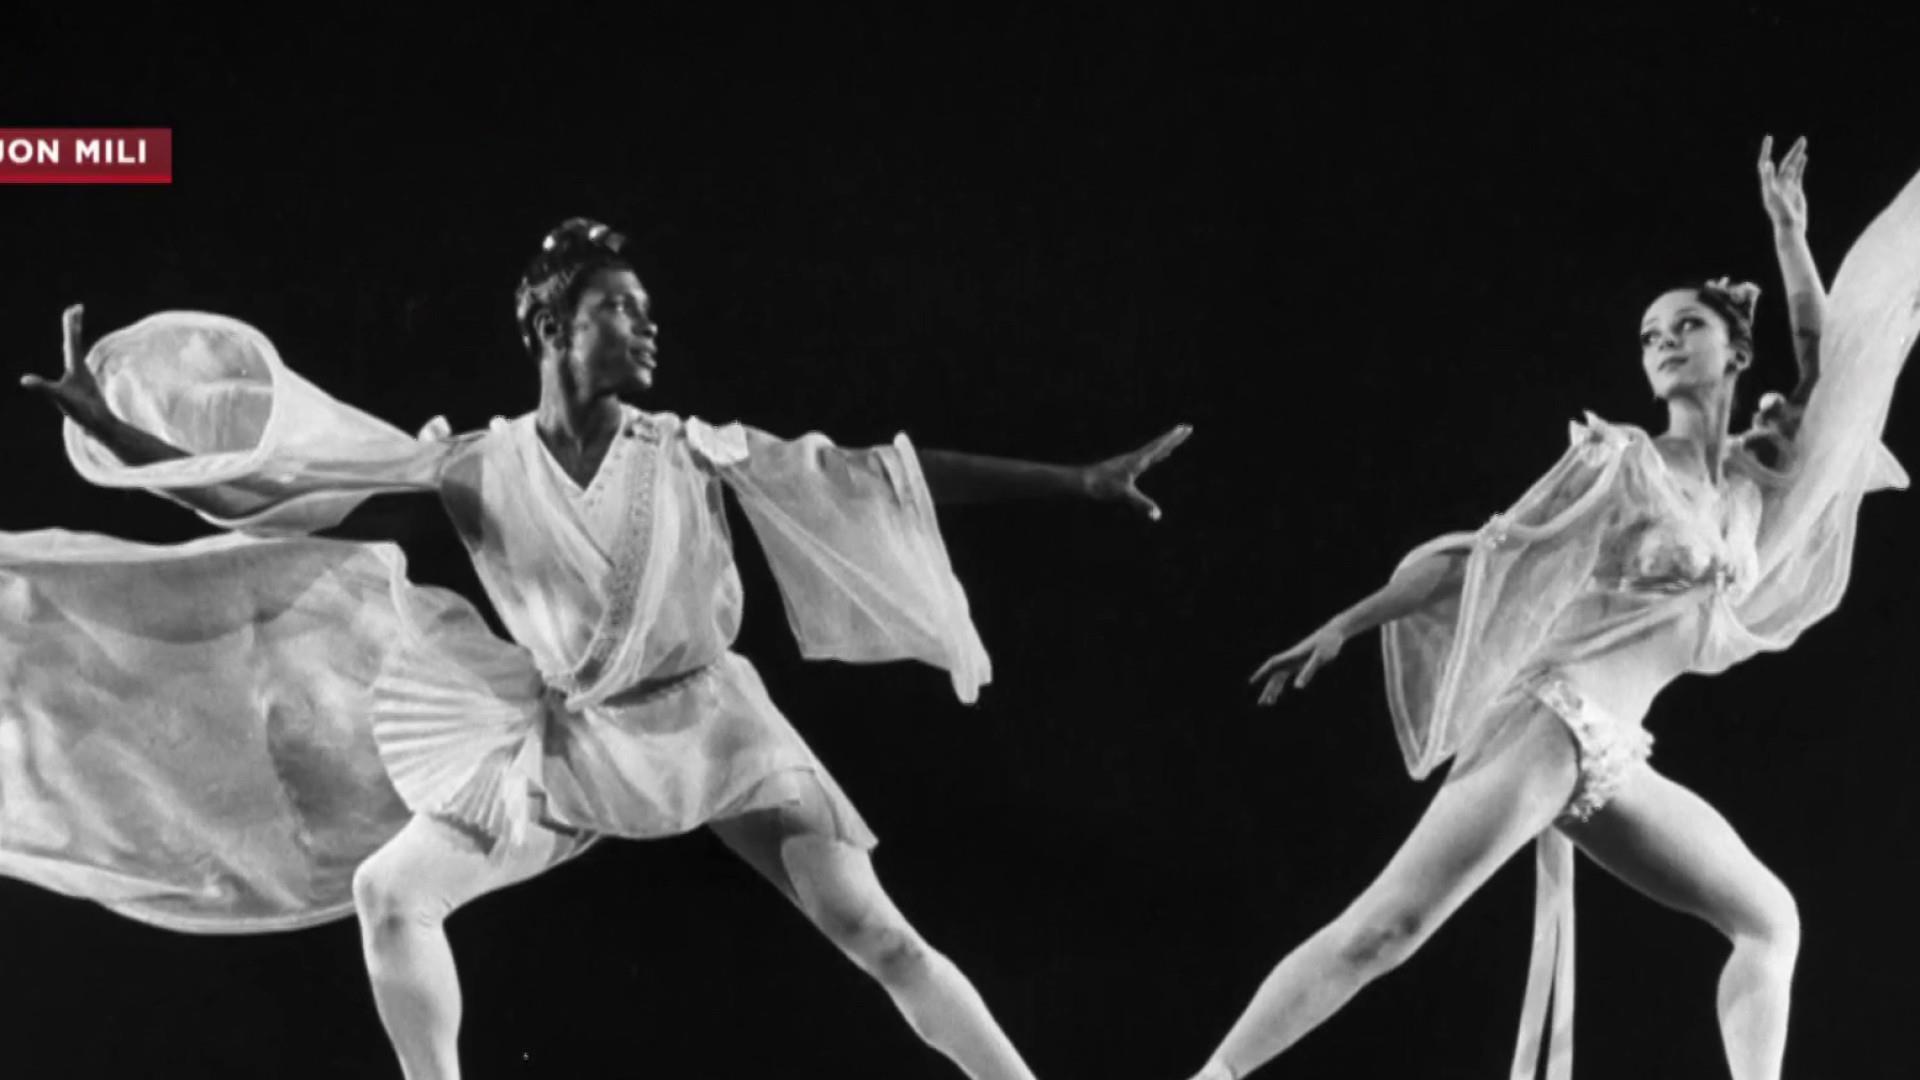 #MonumentalAmerican: First black ballet dancer to get int'l acclaim